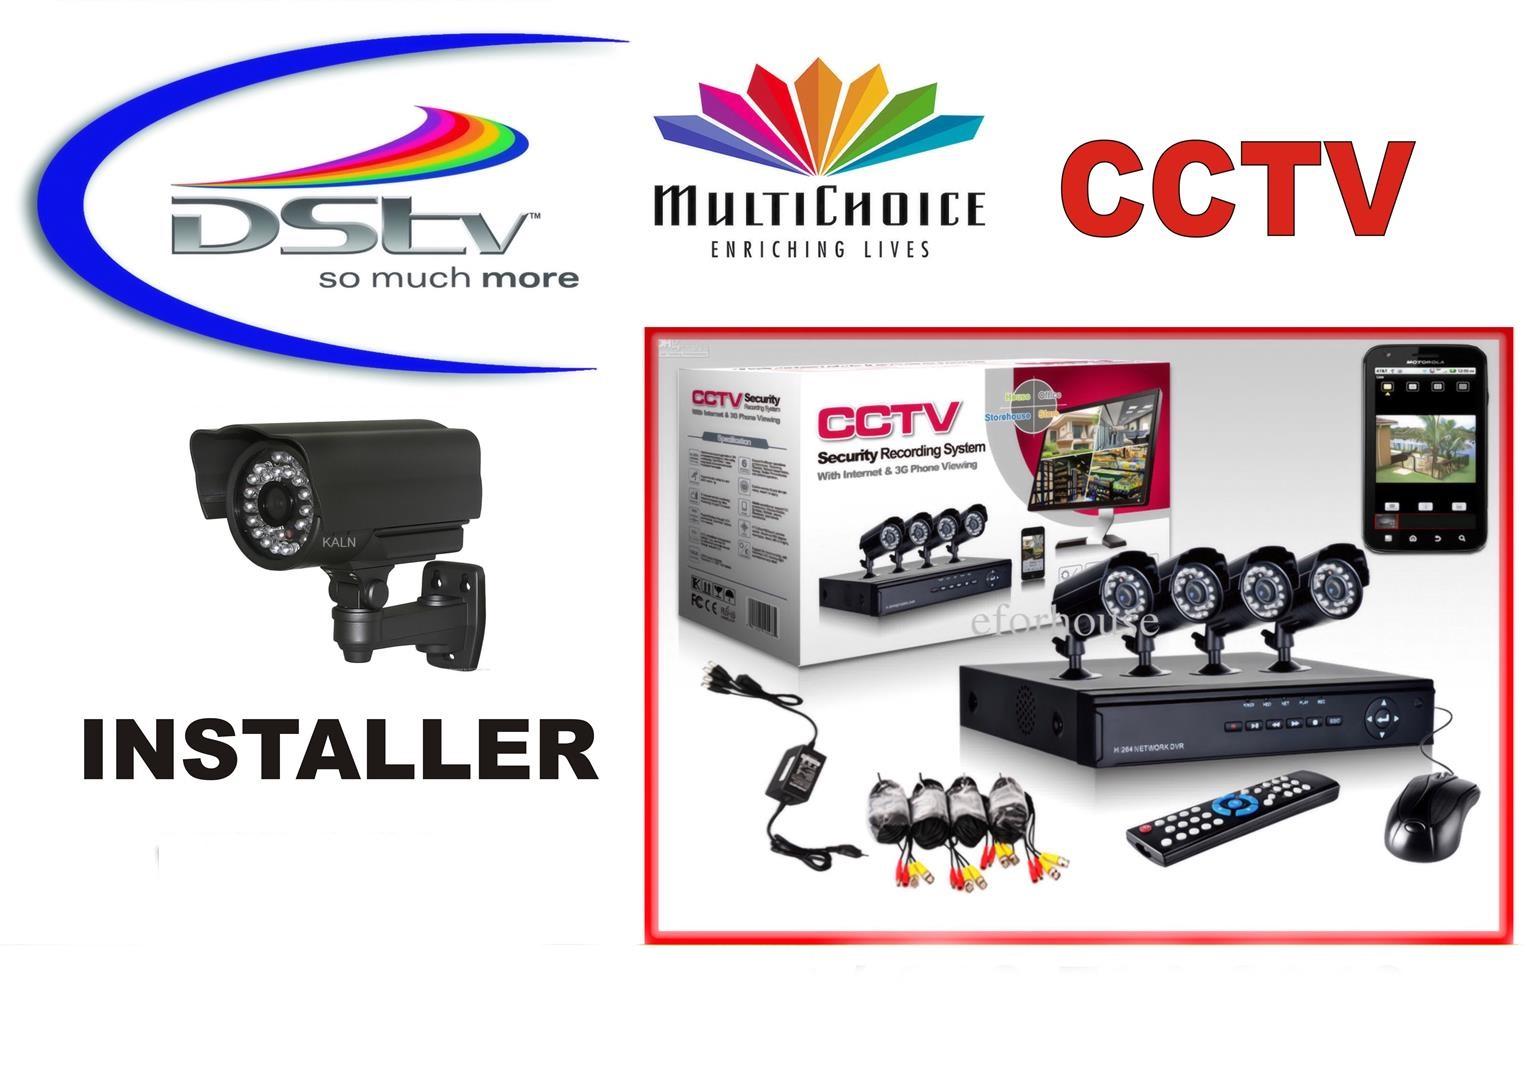 Tv Repairs and Dstv installations